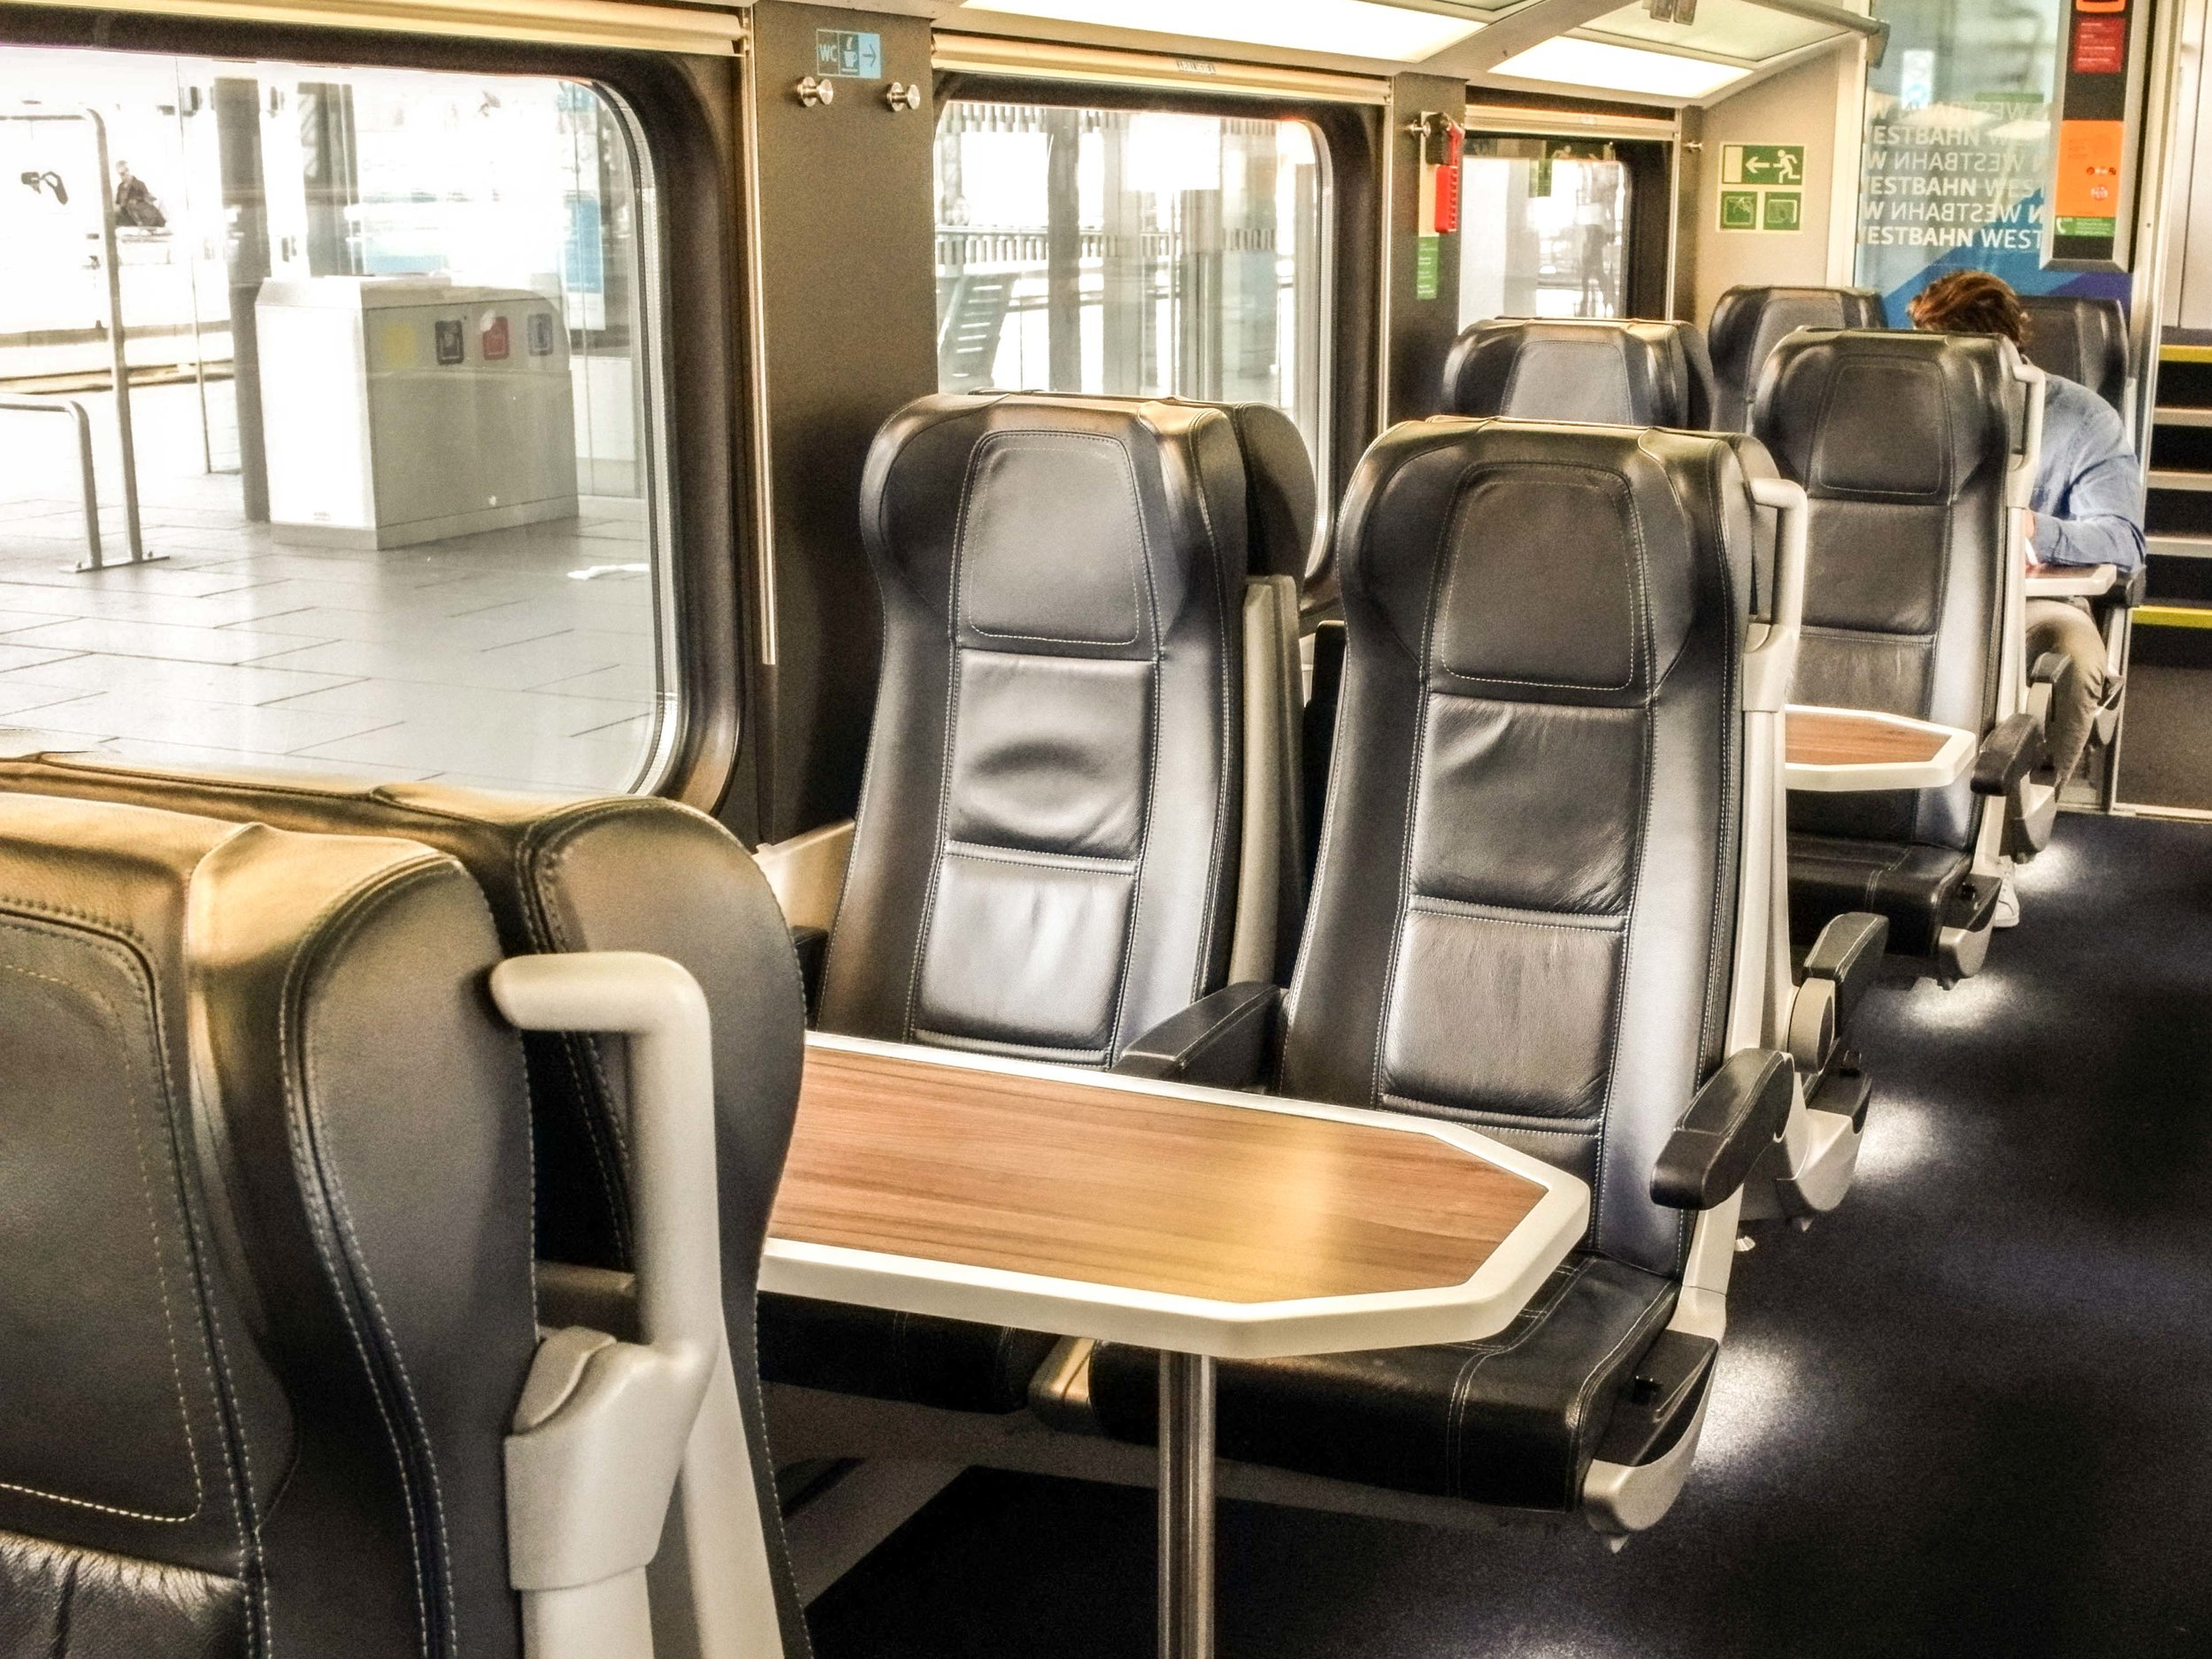 Westbahn economy class